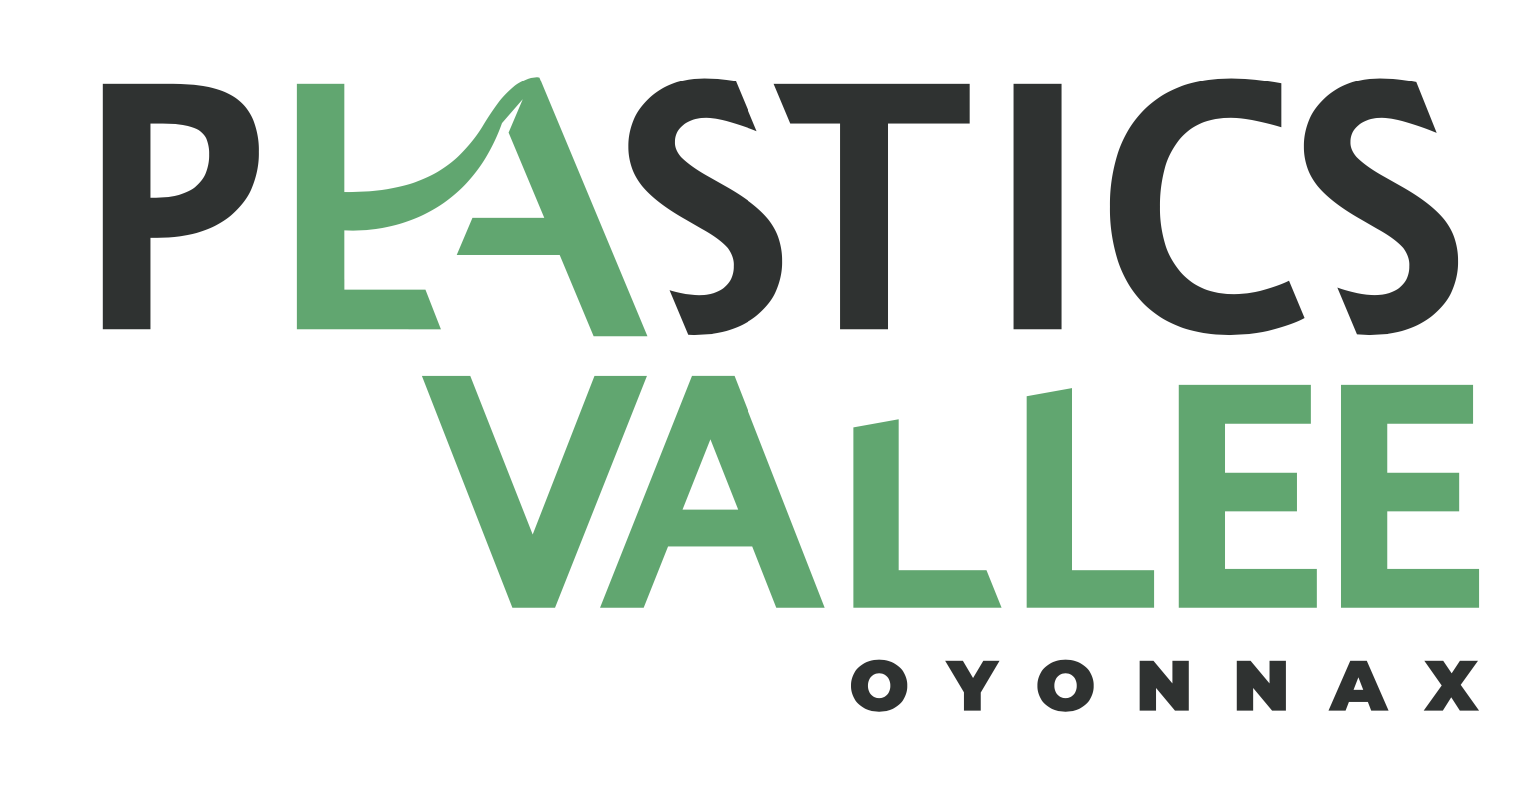 Plastic Vallee